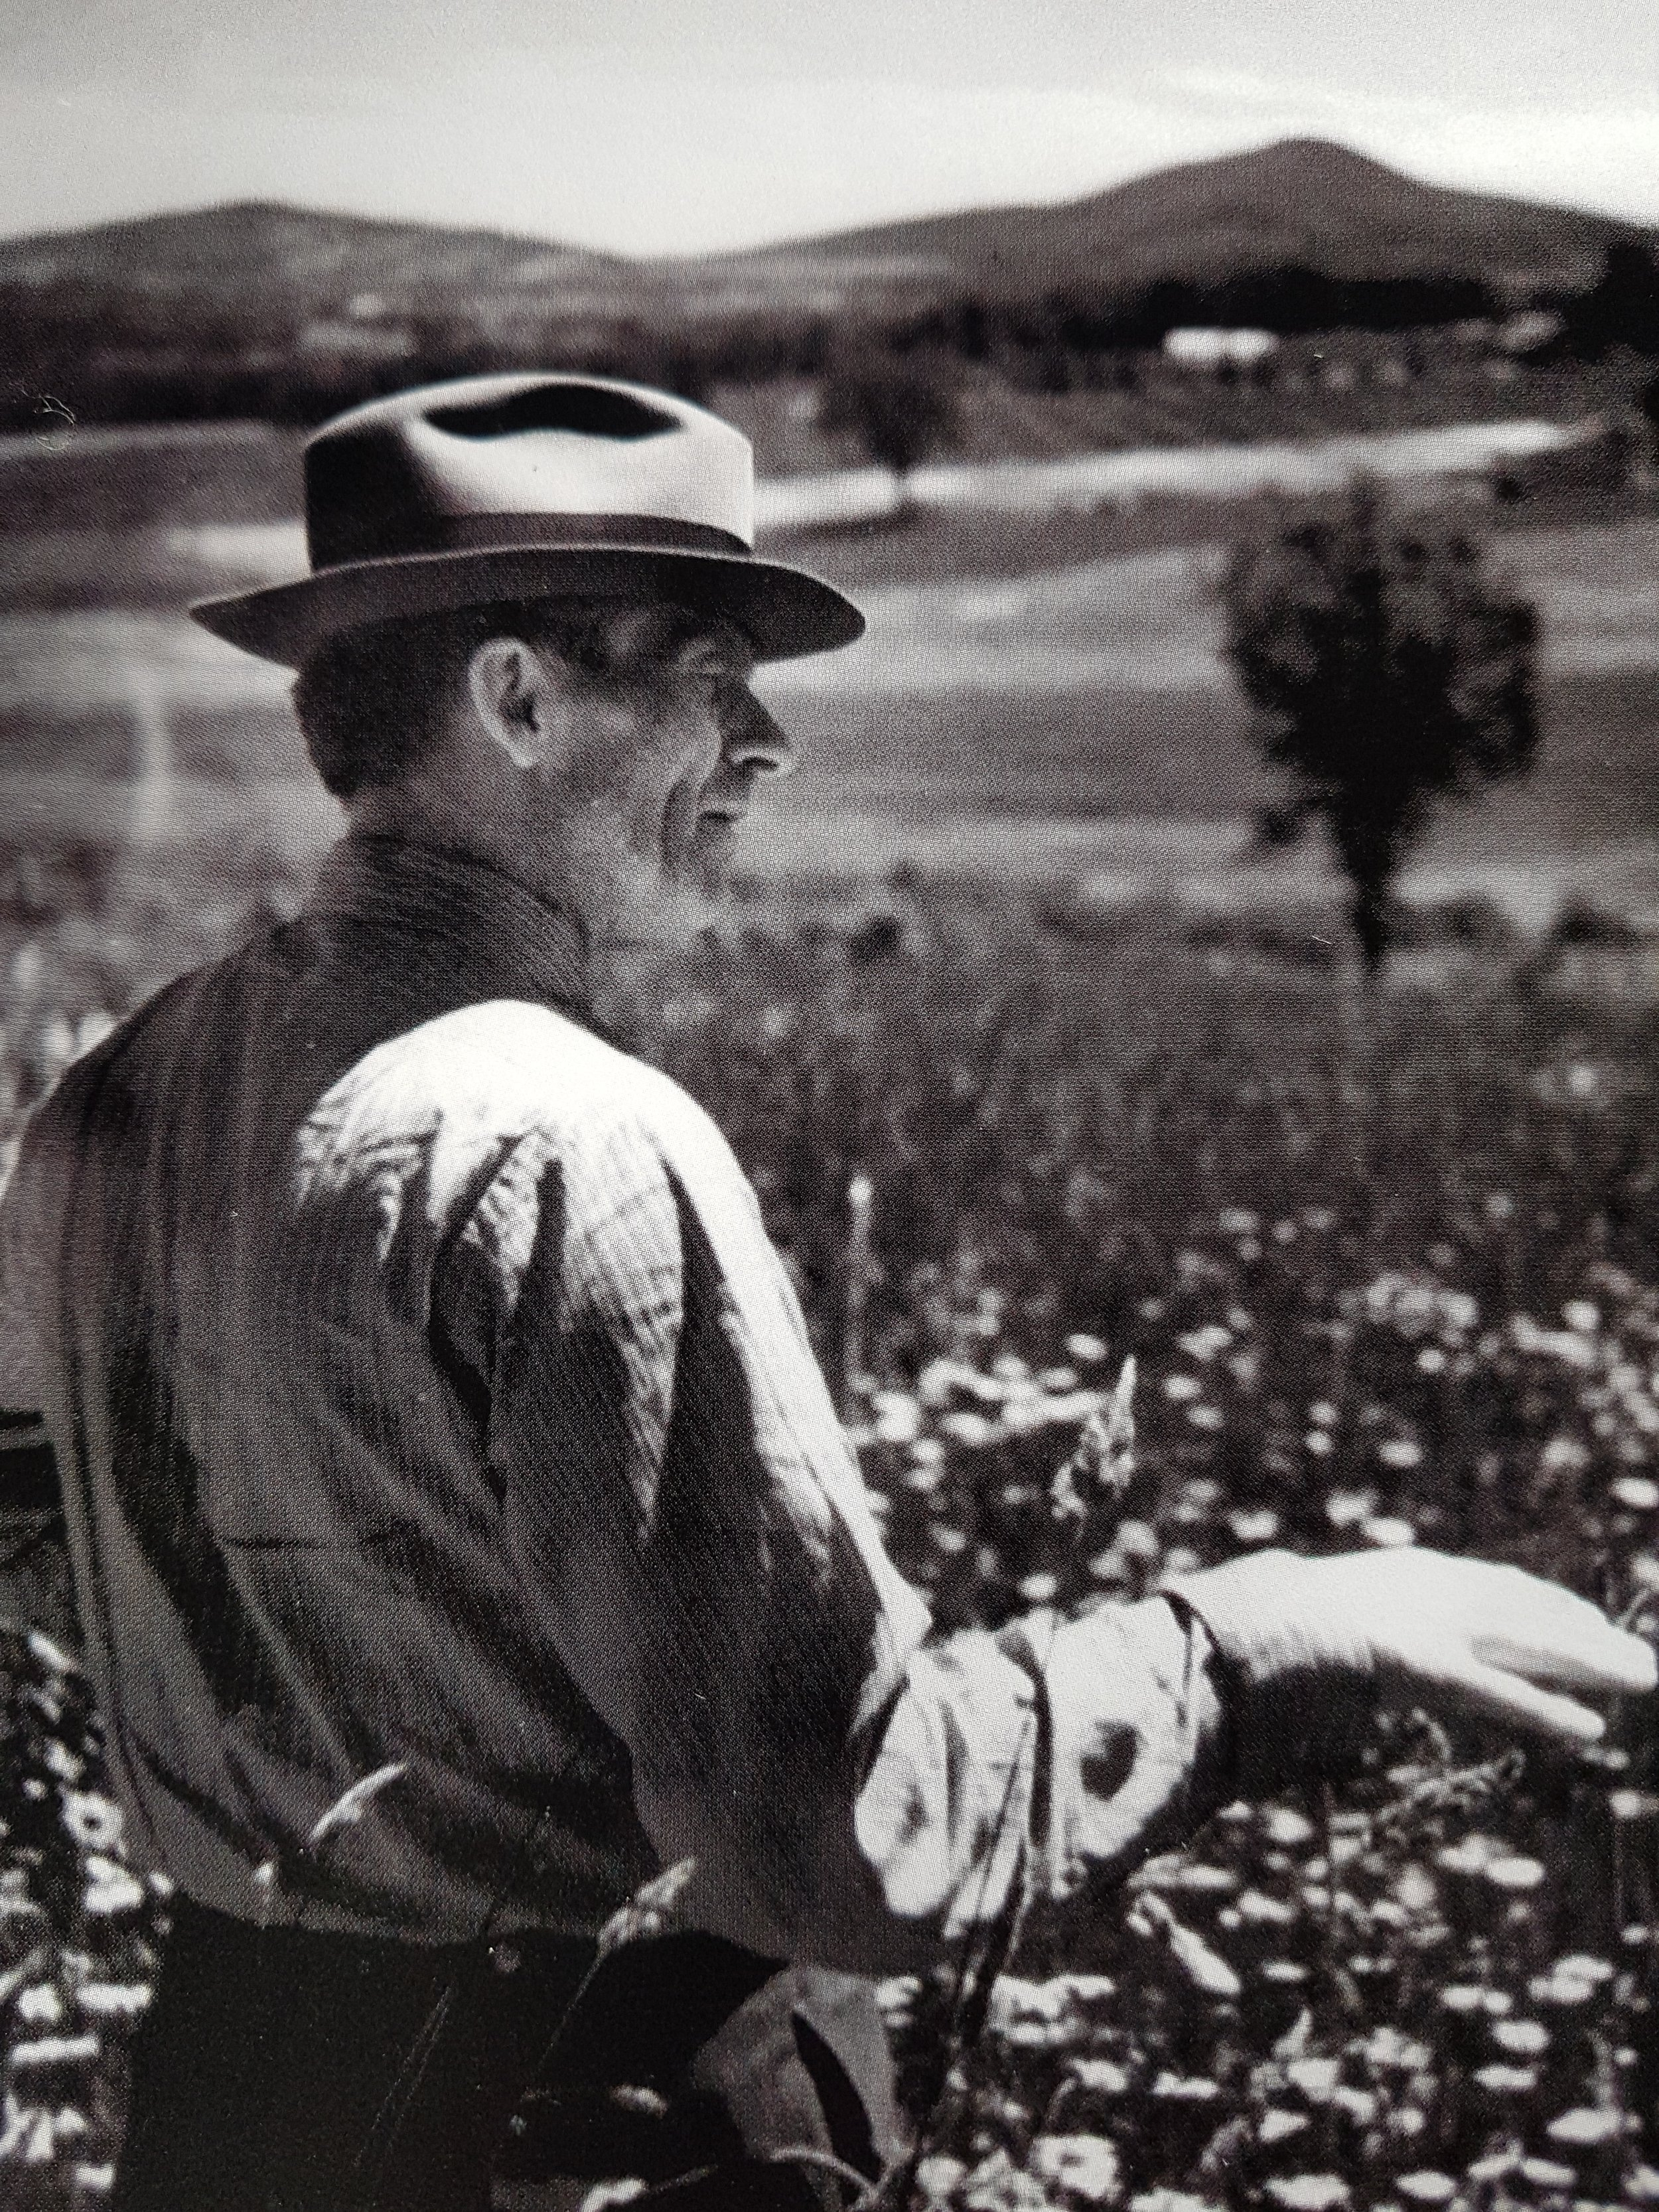 ADÉLARD GODBOUT (1892-1956) - photo : archives familiales